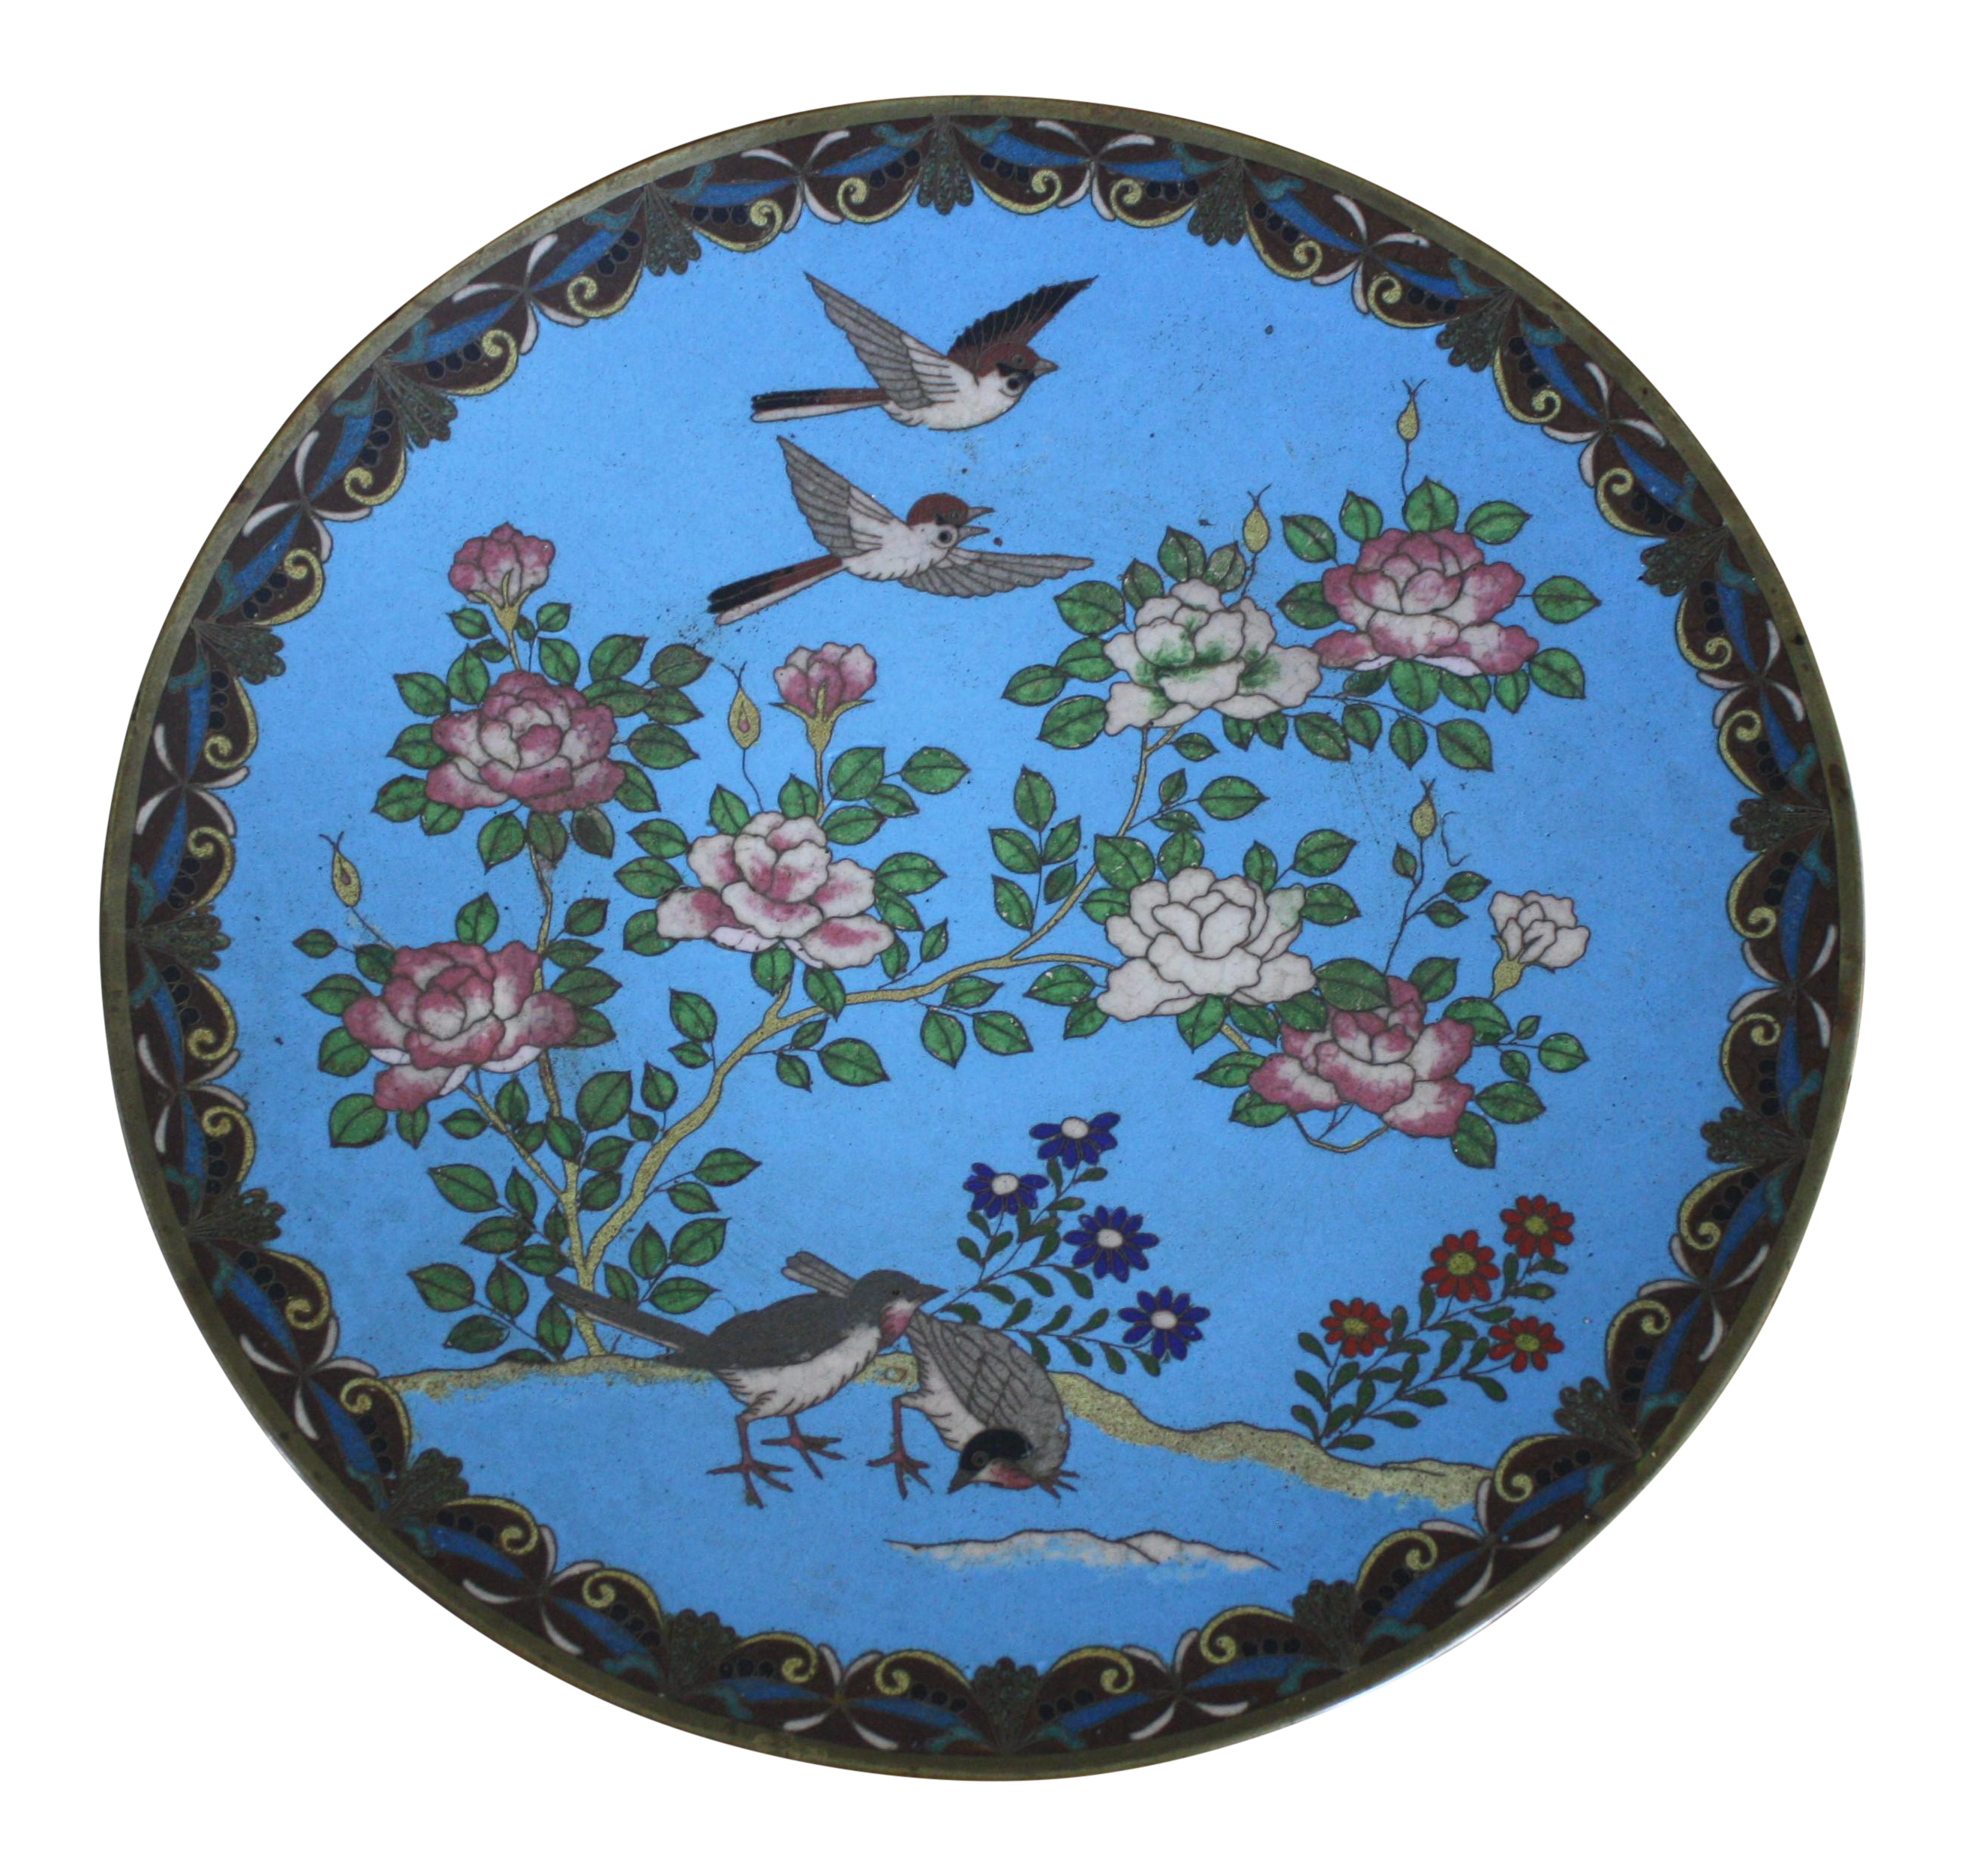 Antique Japanese Meiji Period Cloisonné Charger Plate  sc 1 st  Chairish & Vintage u0026 Used Japanese Decorative Plates | Chairish